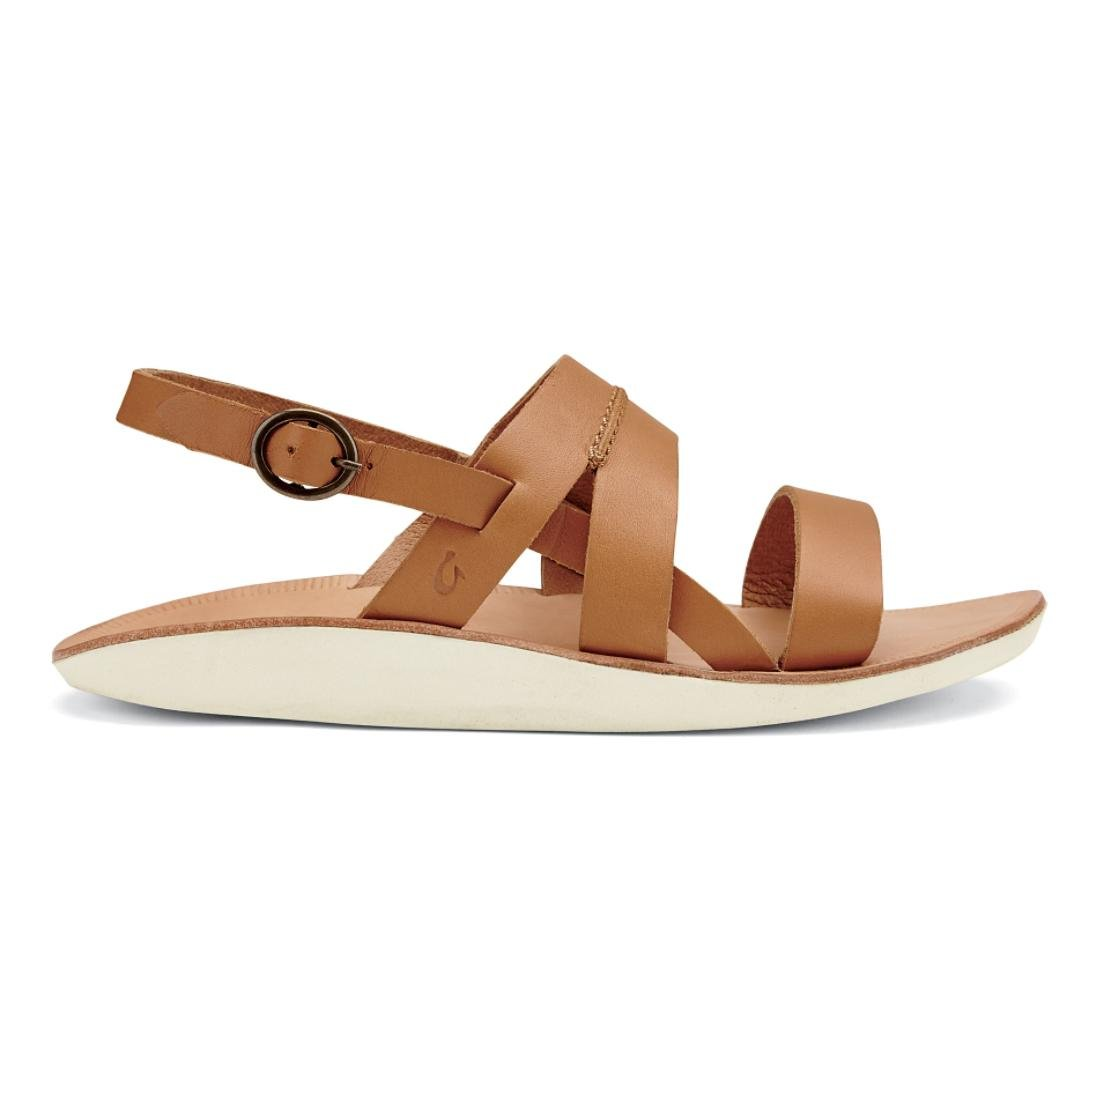 OLUKAI Womens Loea Sandal B010EAKUBO 6 B(M) US|Mustard/Bone